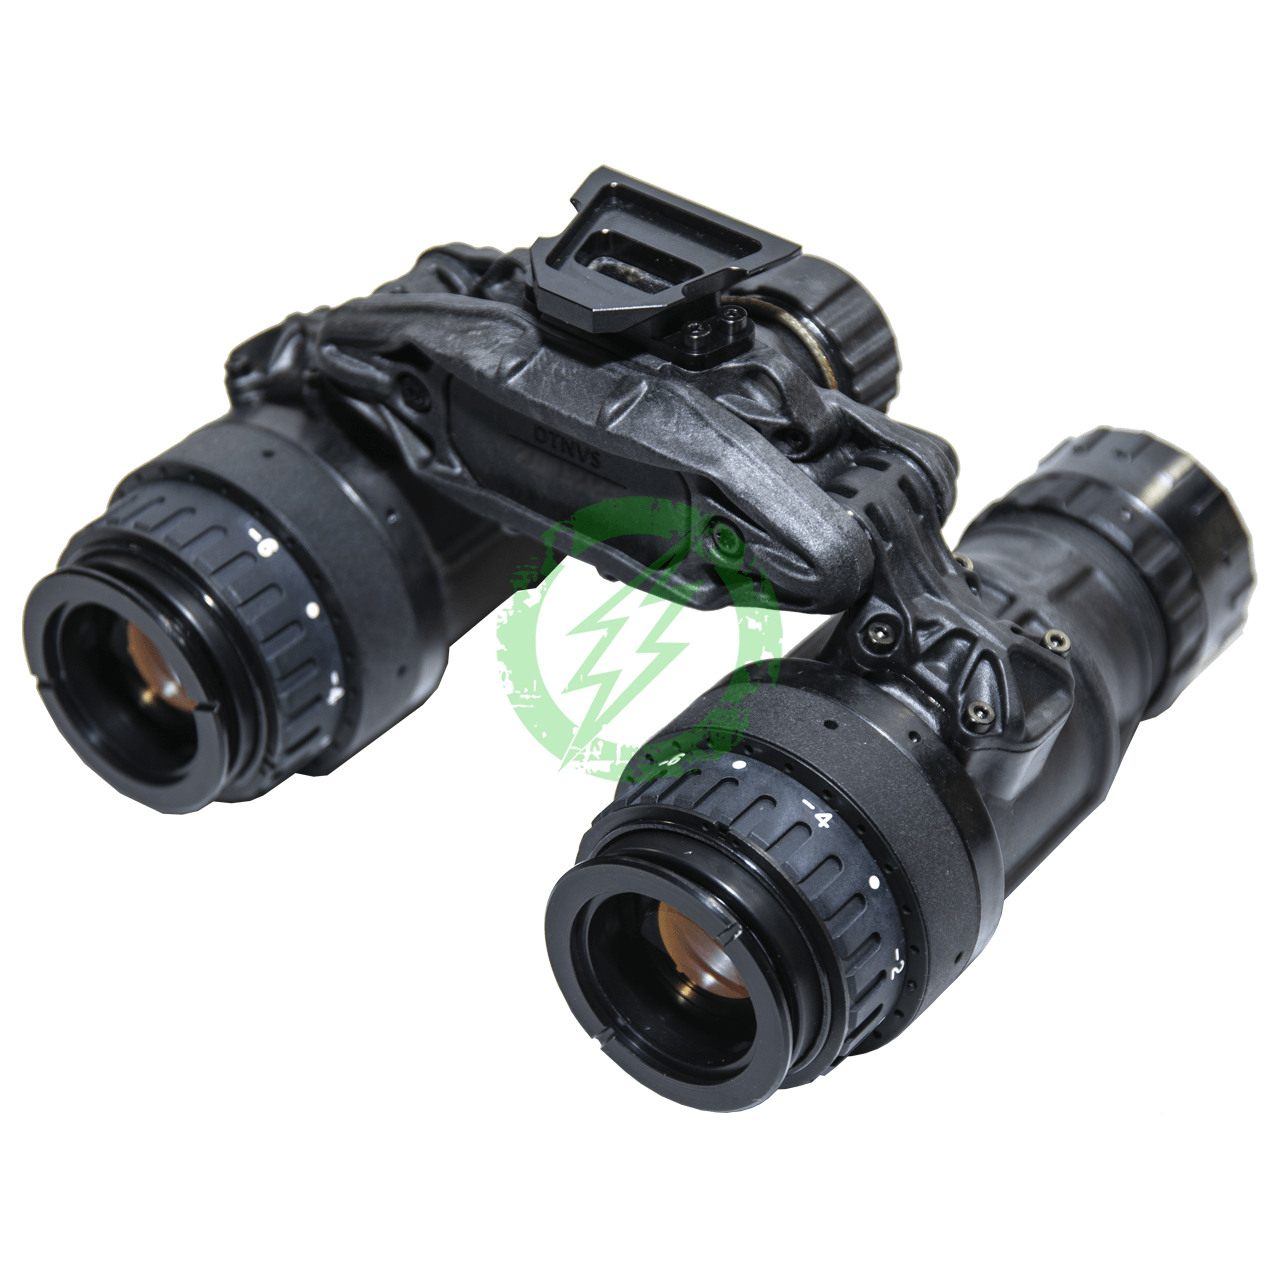 4G ECHO White Phosphor ACT DTNVS-14 Binocular Night Vision Device Rear